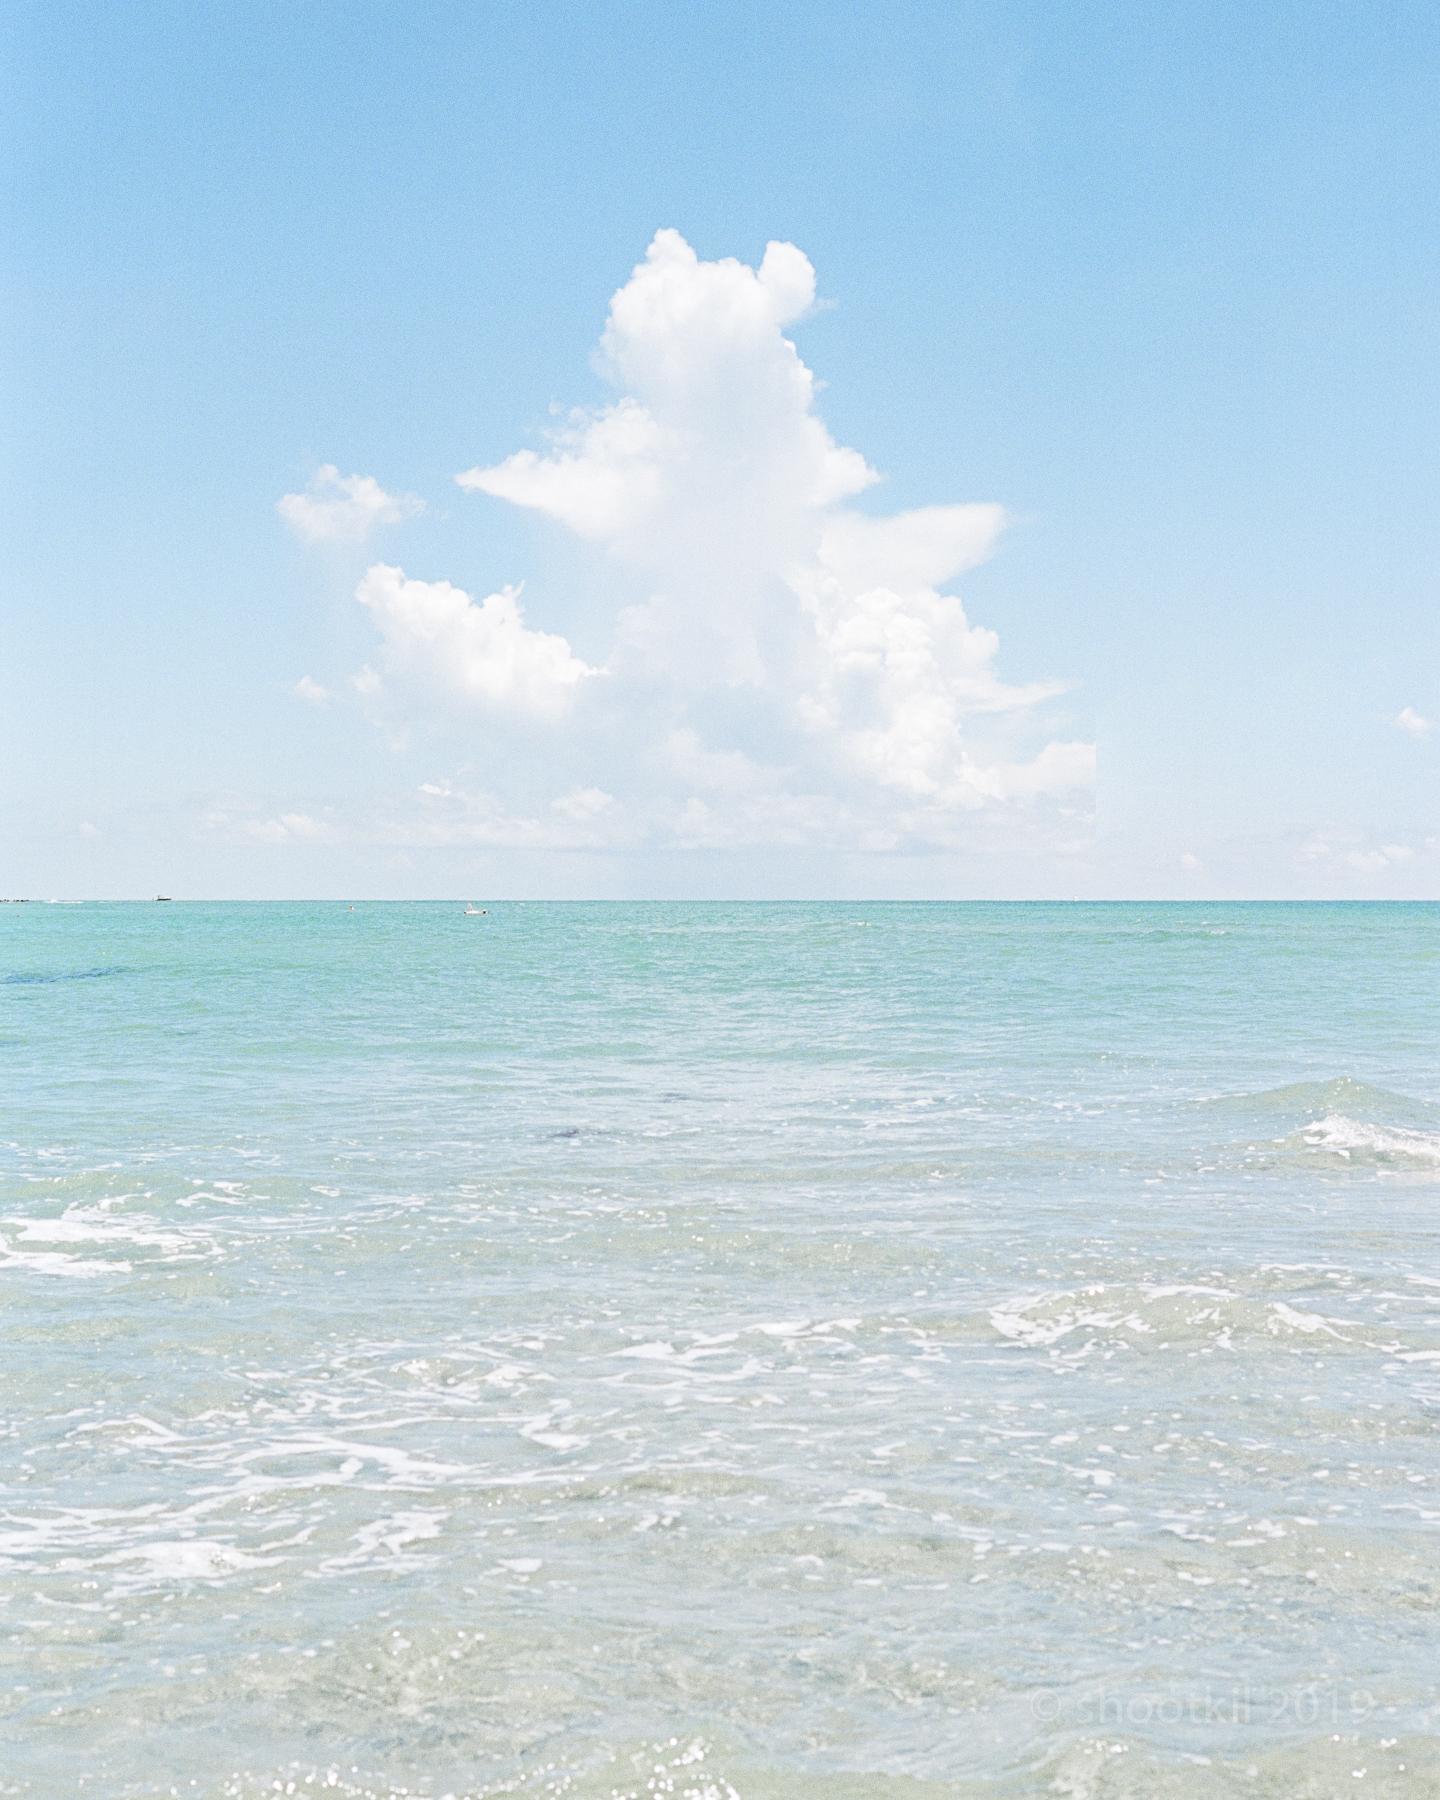 Dog-Beach-Ripley-07272019-16.jpg